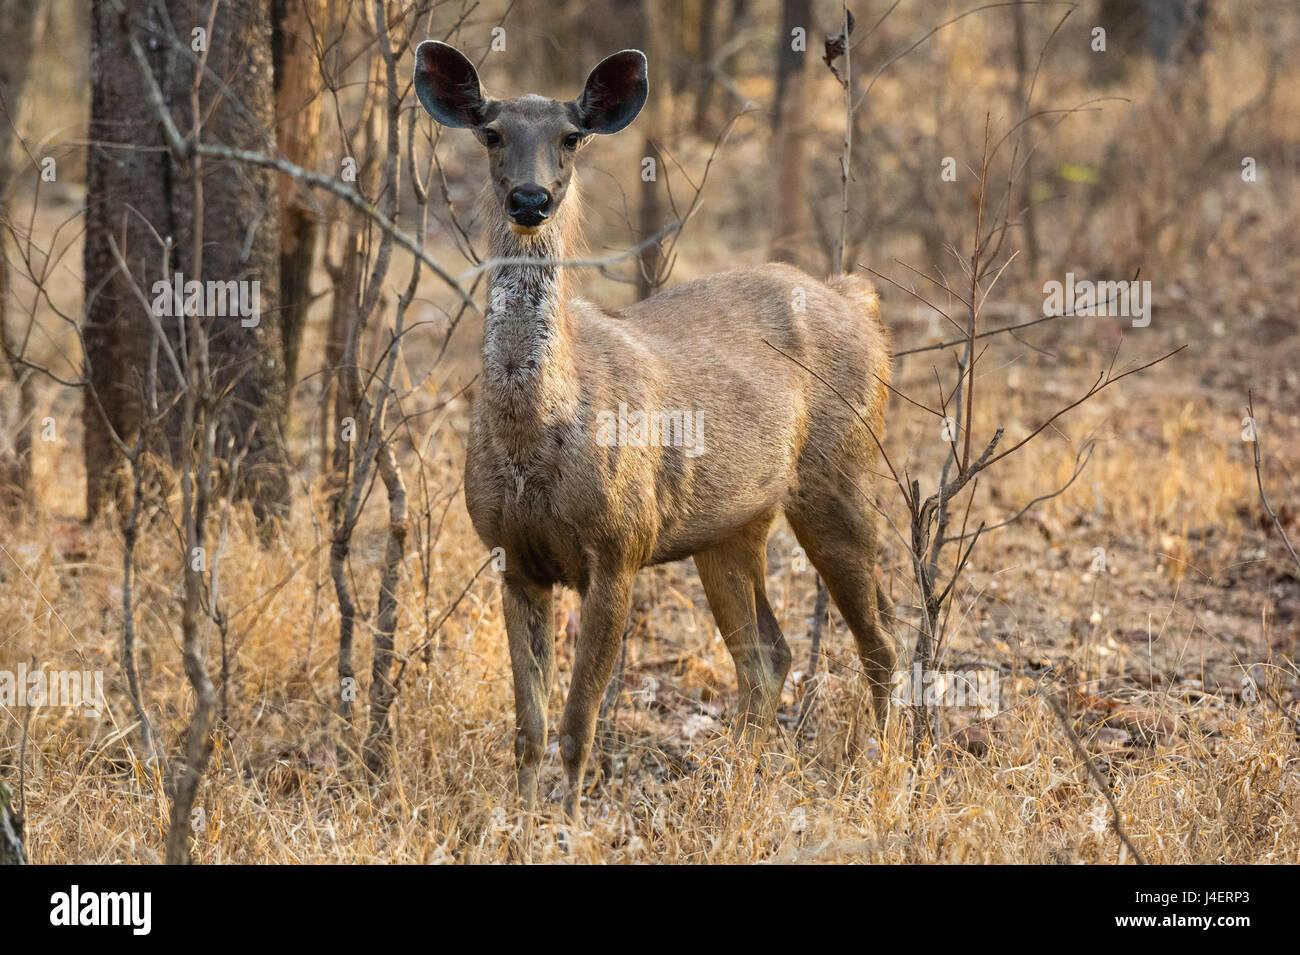 sambar deer (Rusa unicolor), Bandhavgarh National Park, Madhya Pradesh, India, Asia - Stock Image